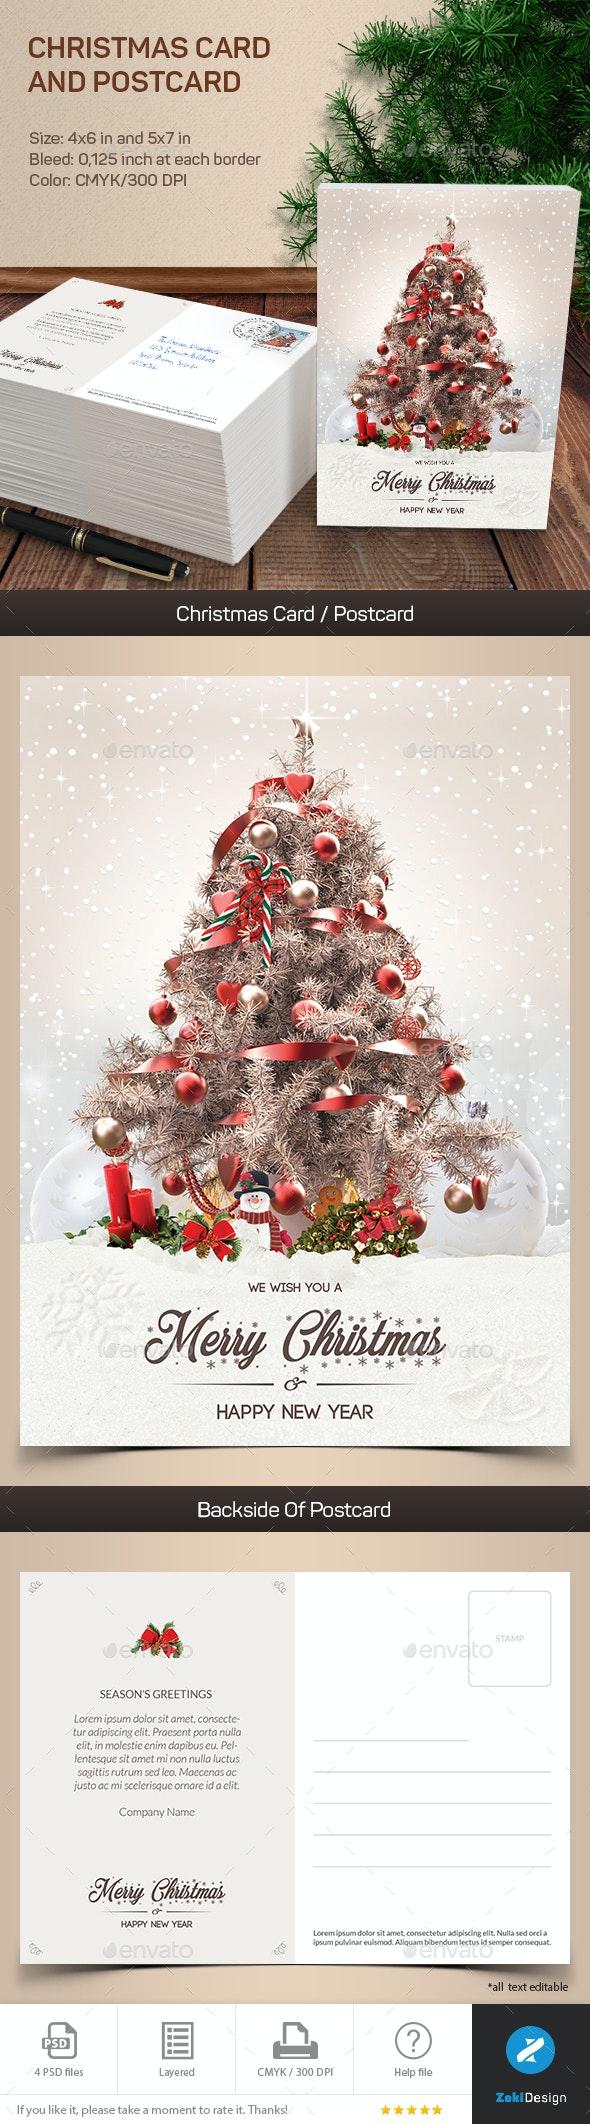 Greeting Christmas Card and Postcard - Holiday Greeting Cards